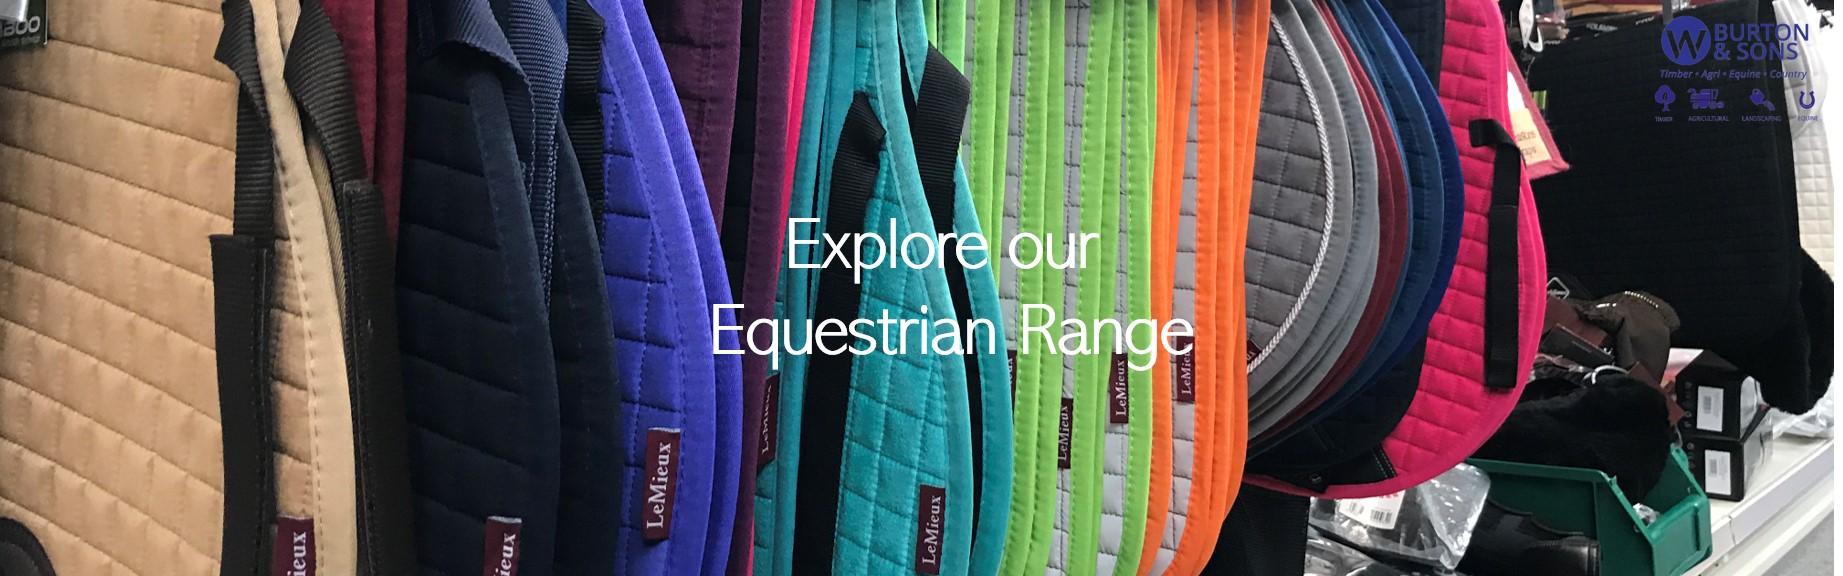 Equestrian Range at W Burton